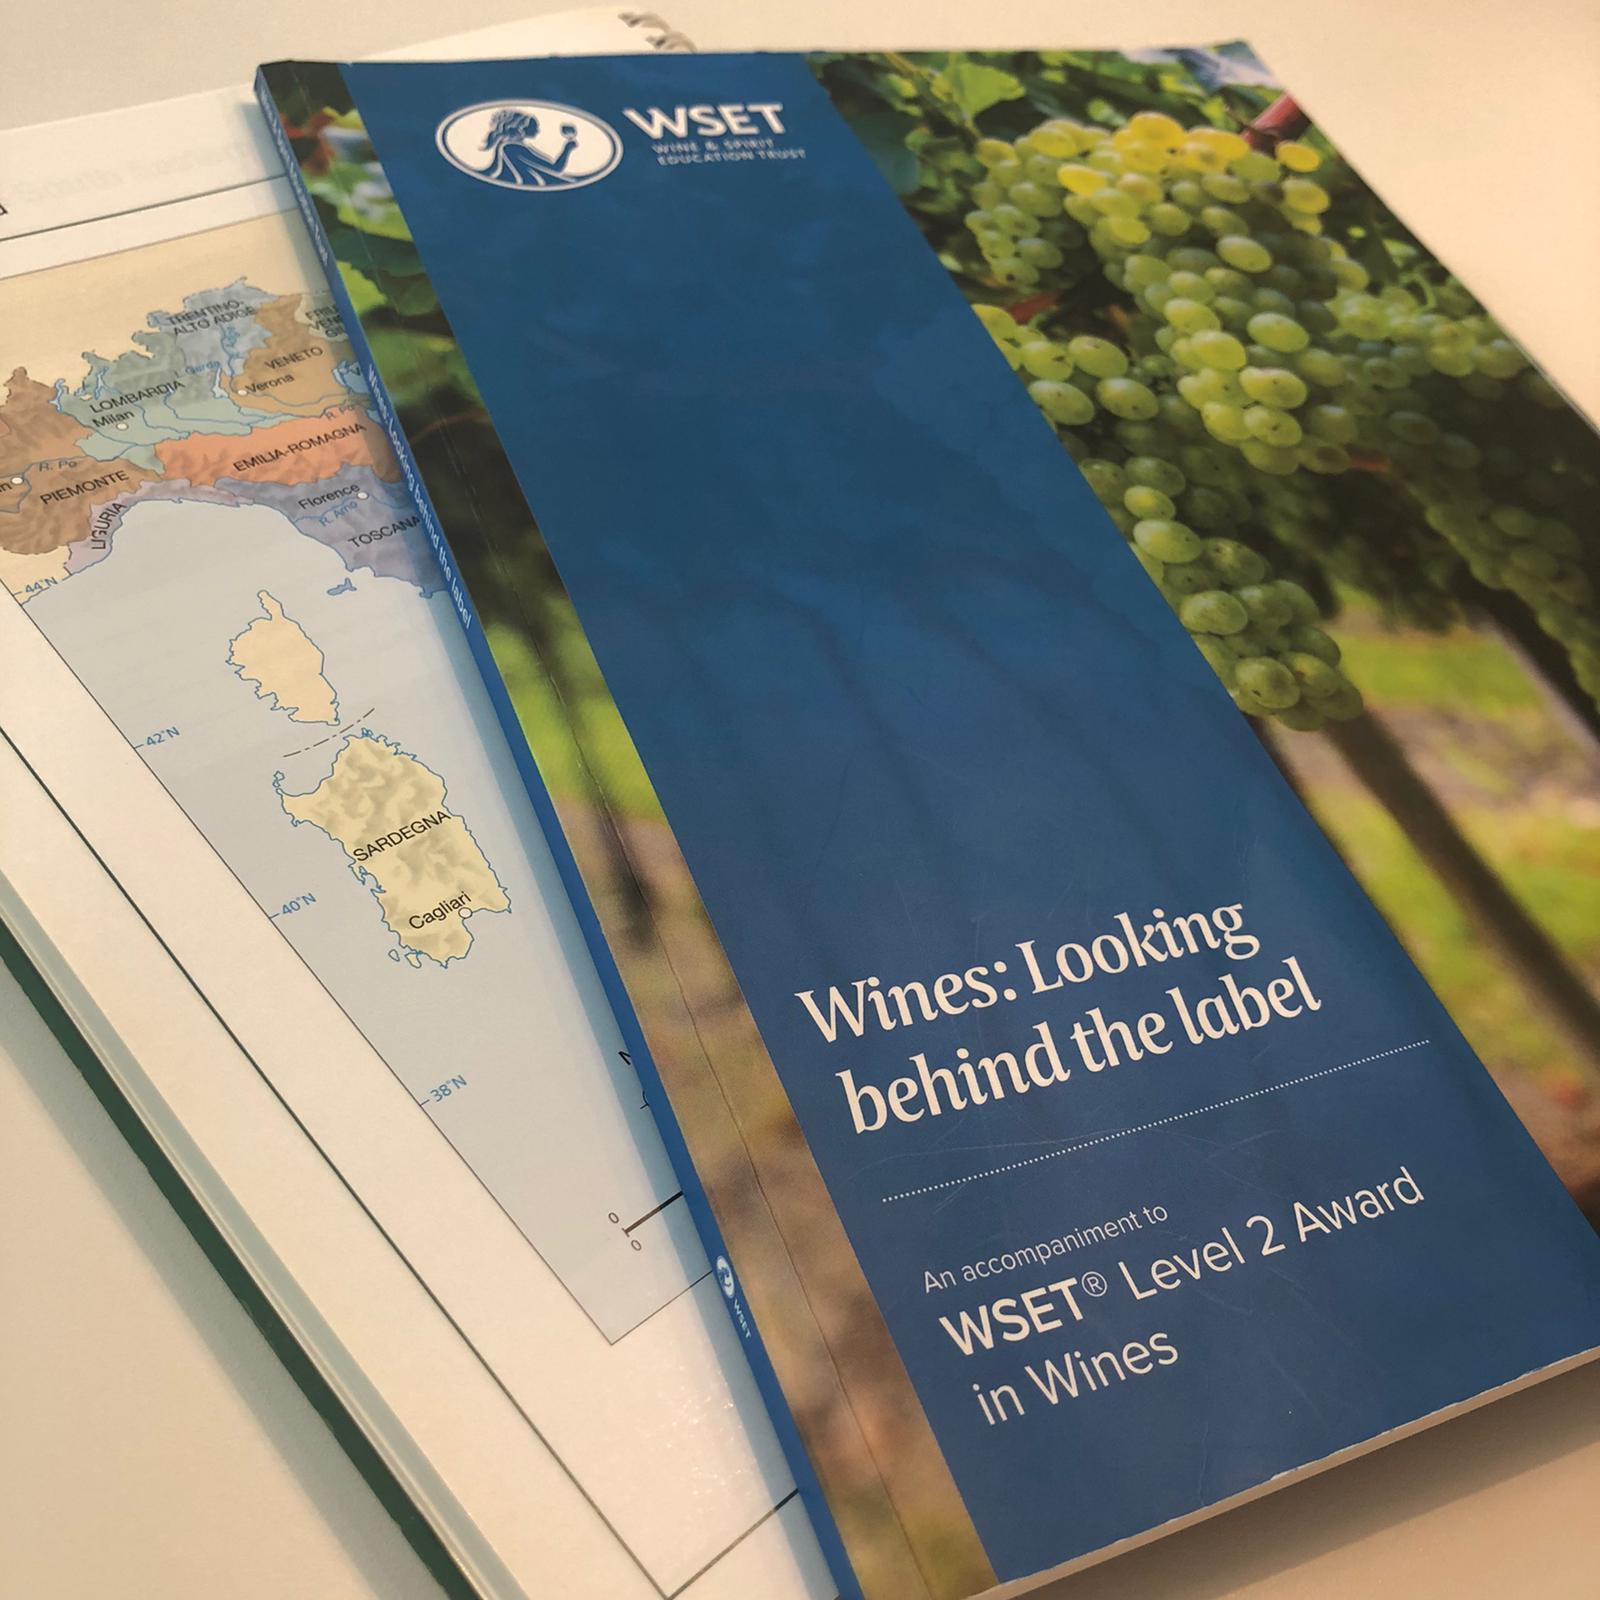 WSET Level 2 Course Books